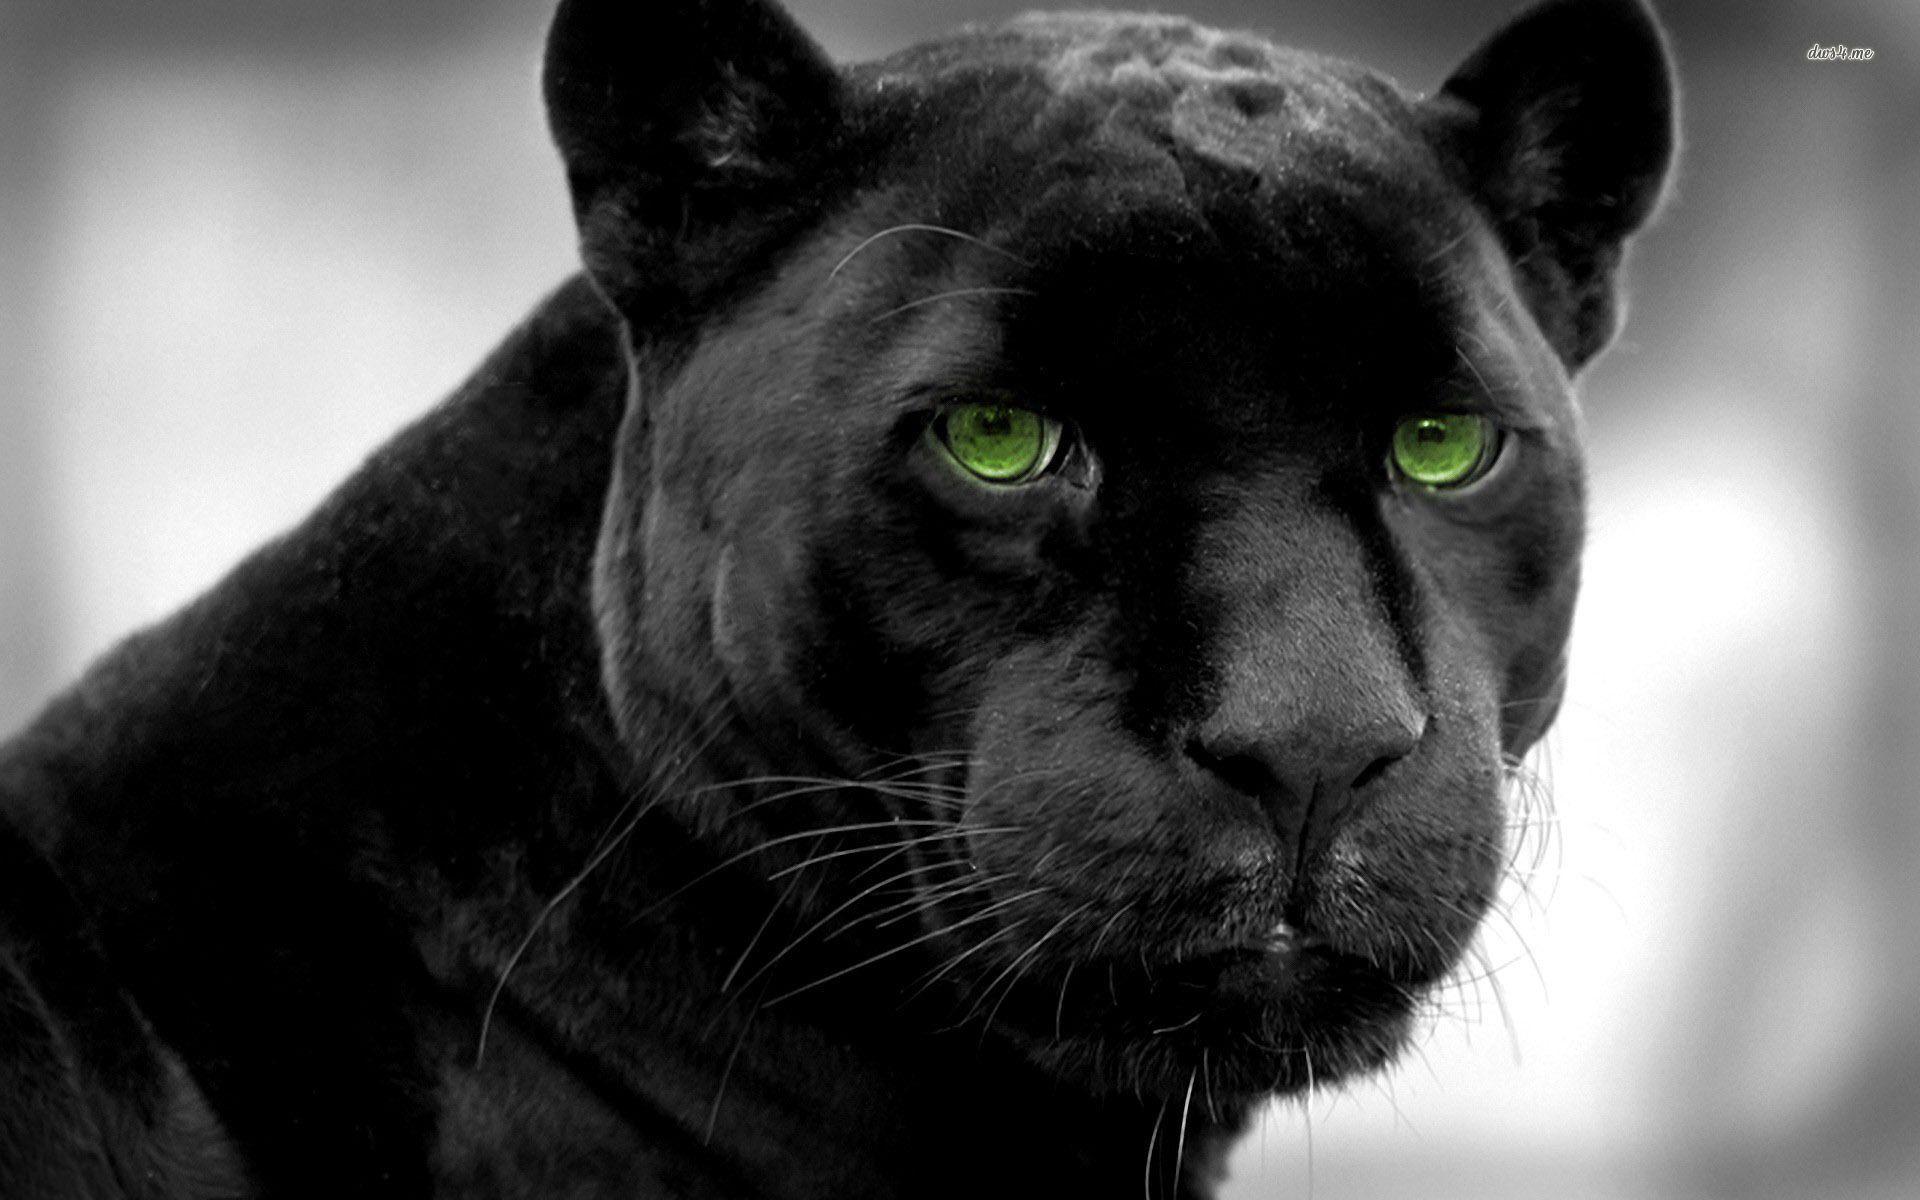 Black Panther Wallpapers Black jaguar animal, Black